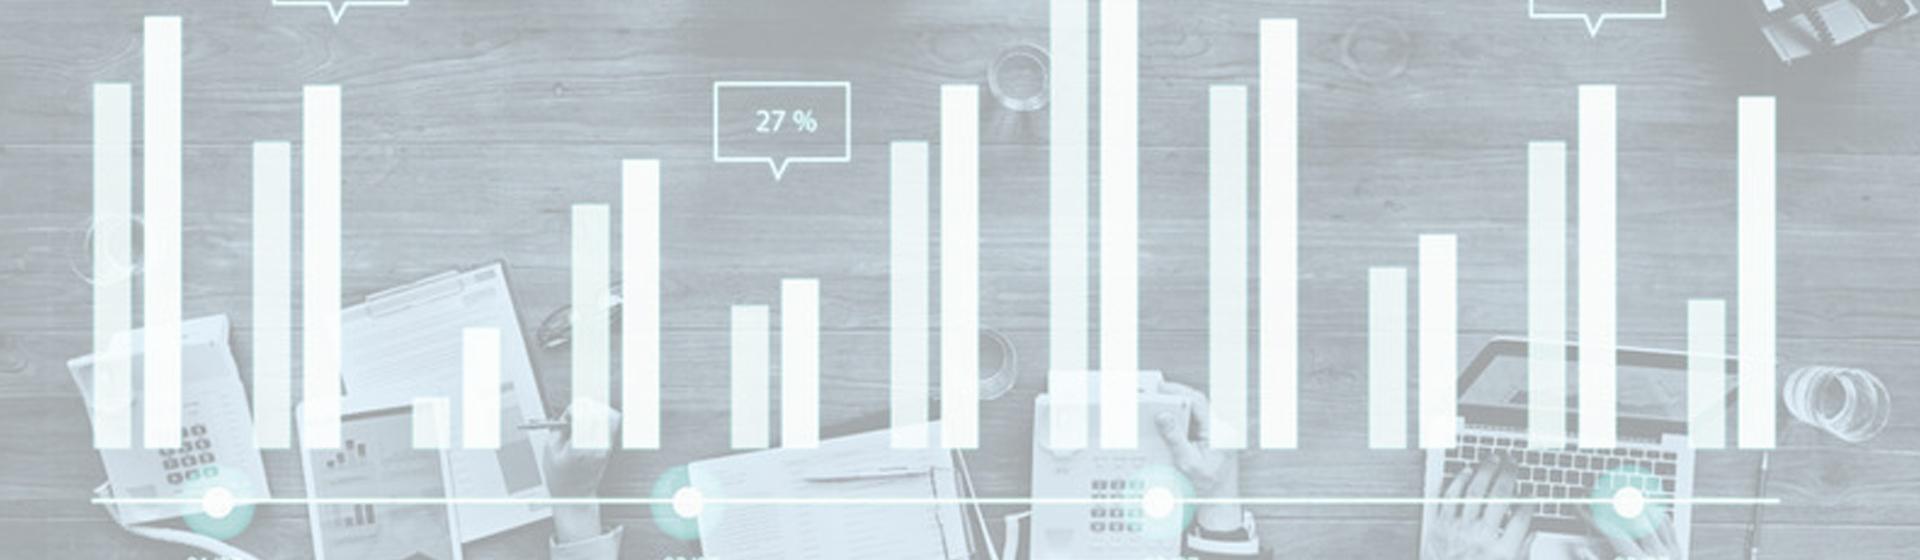 Bw assinatura anual data analytics